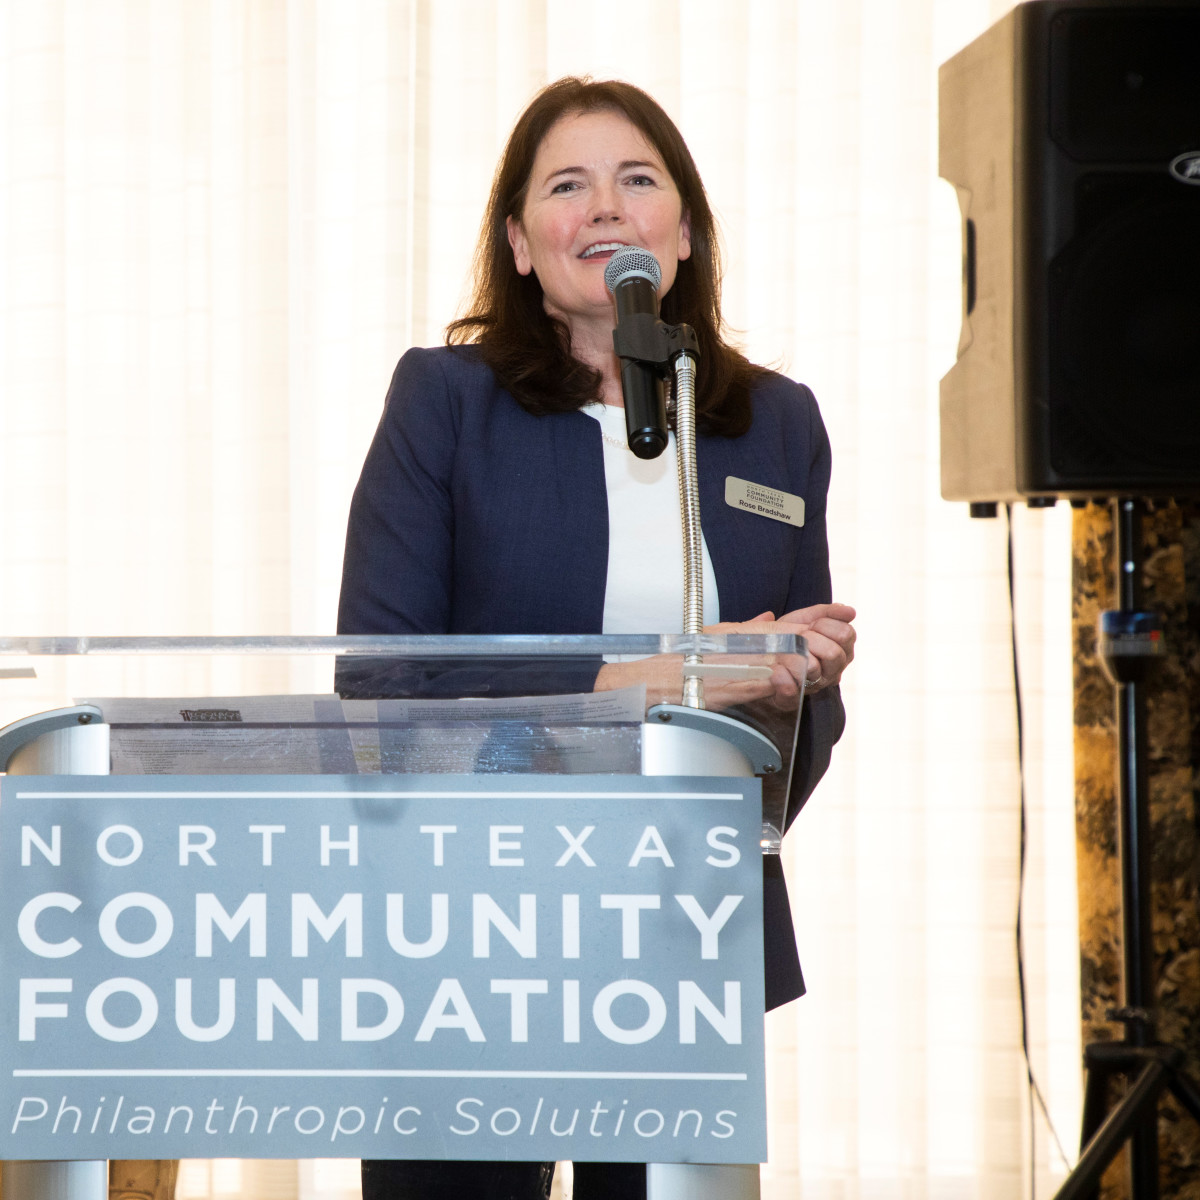 North Texas Community Foundation, Rose Bradshaw